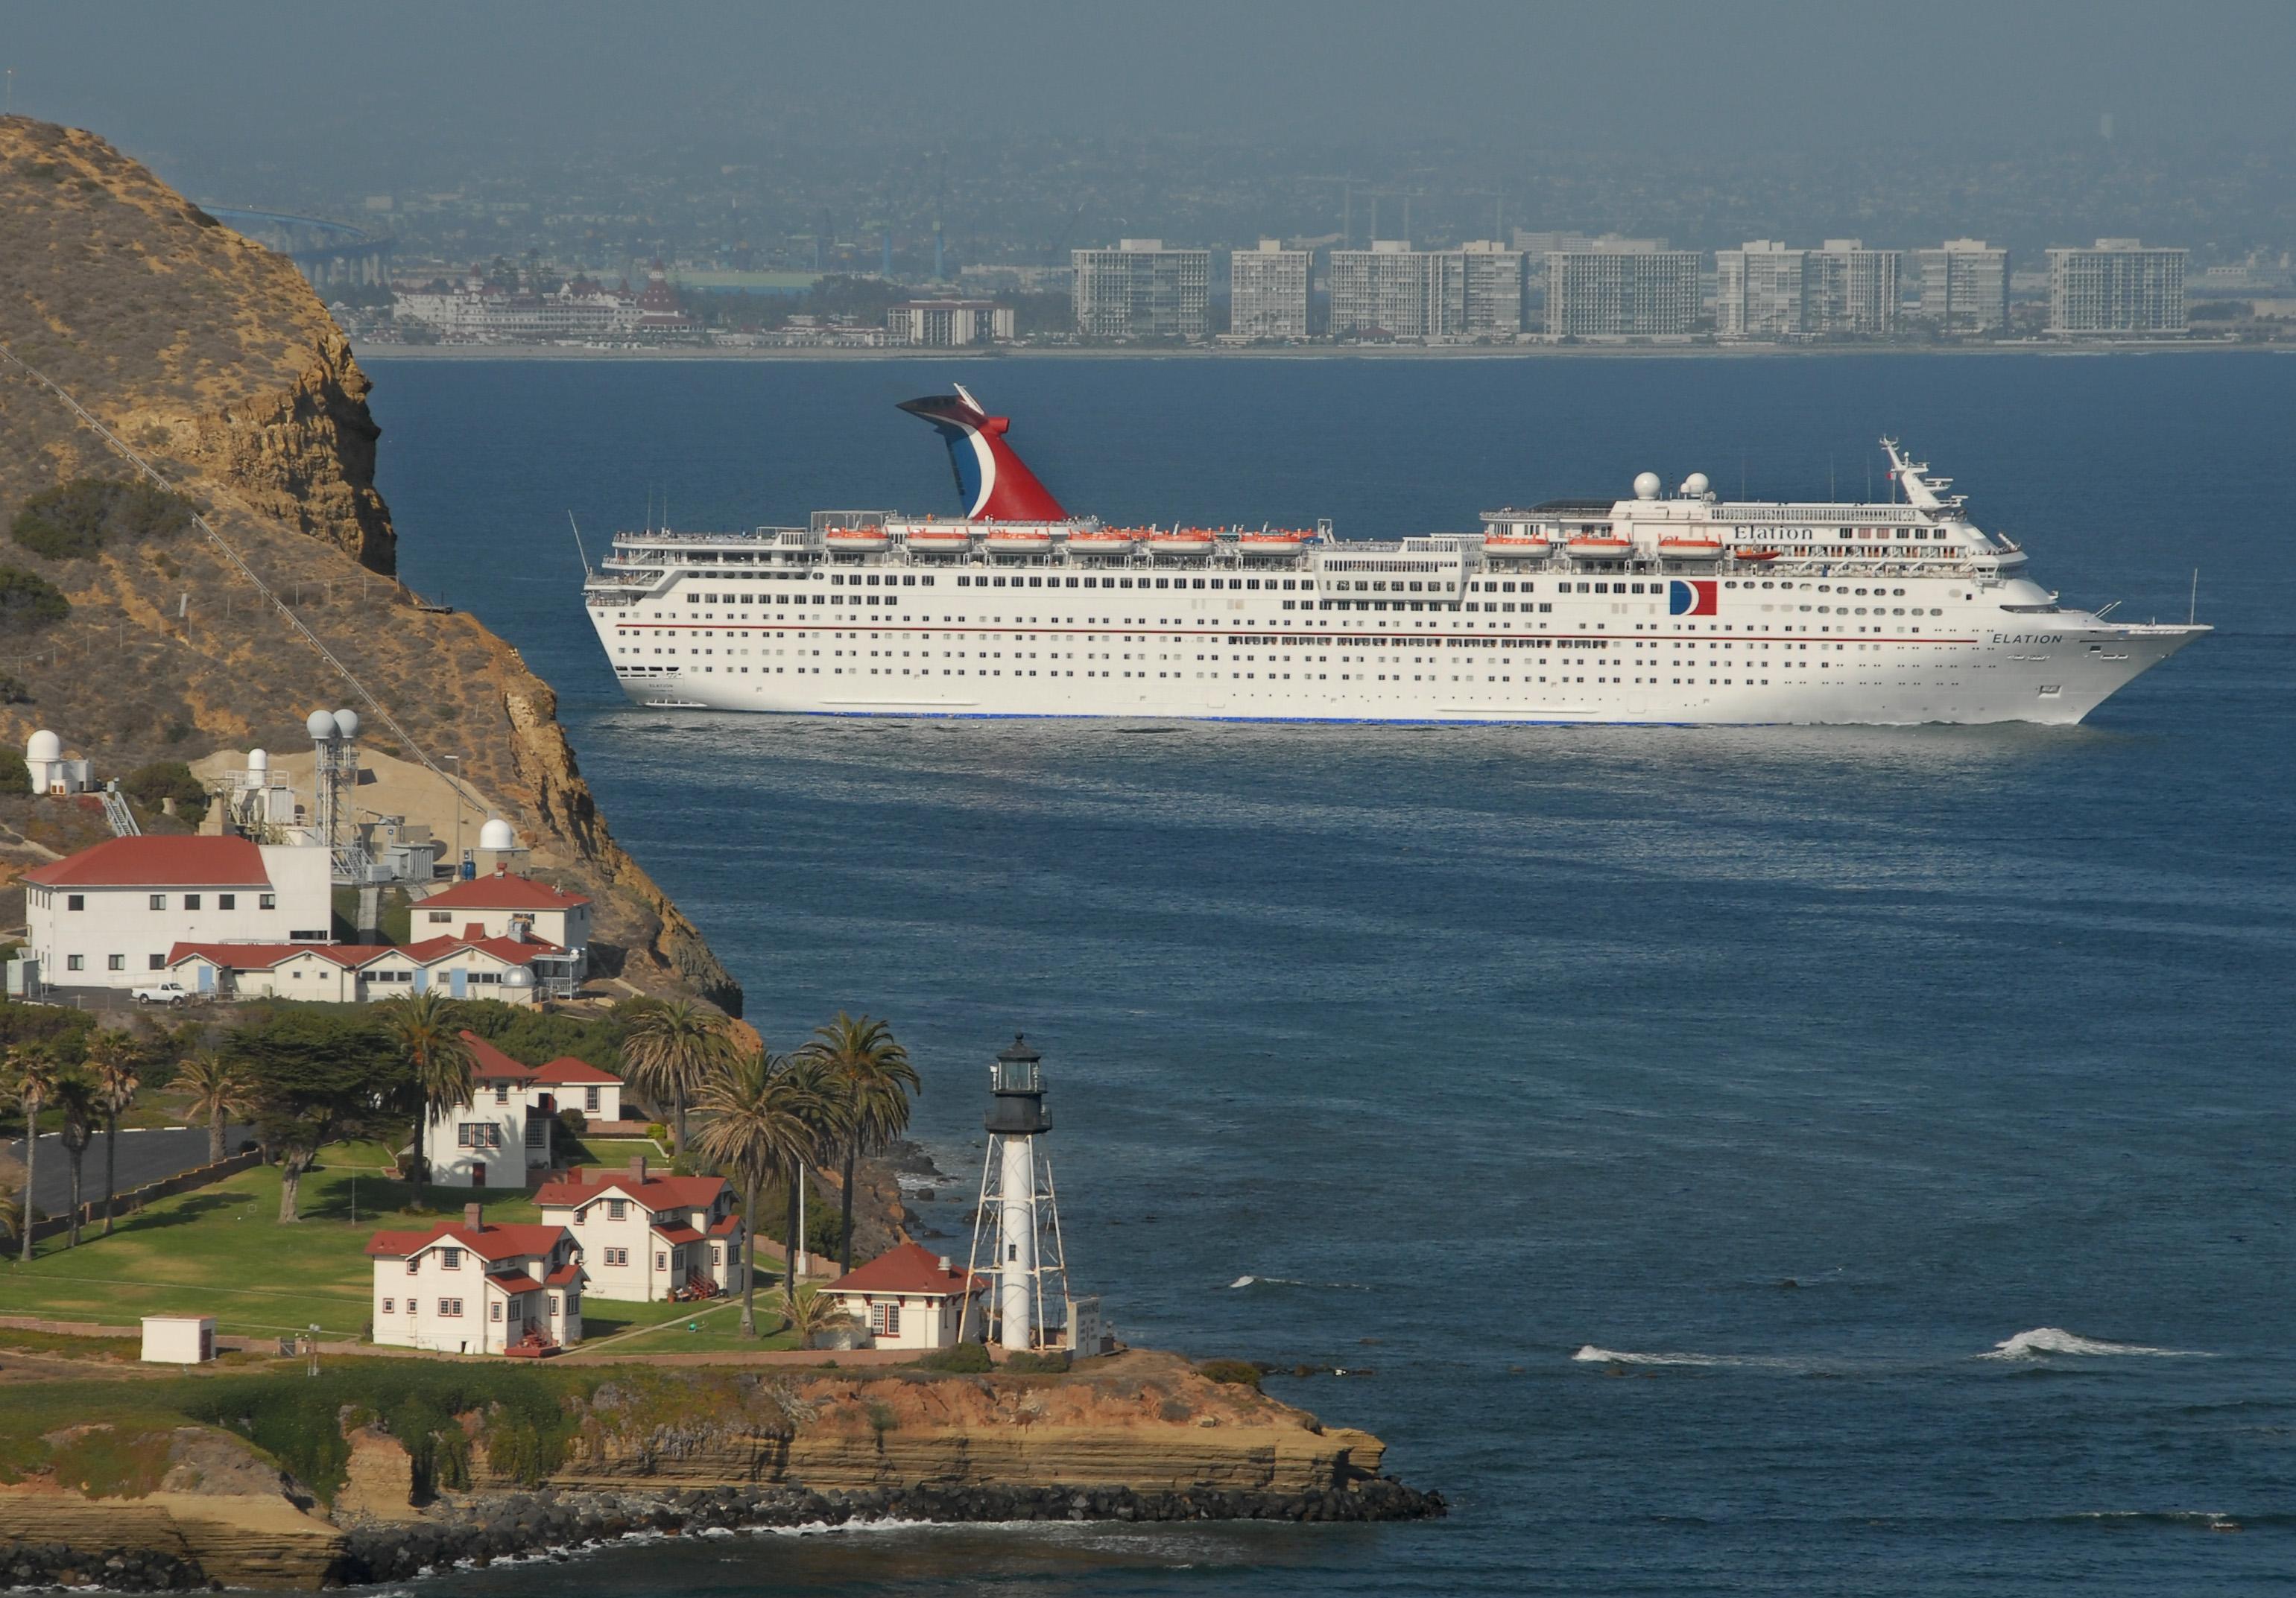 San diego casino cruise